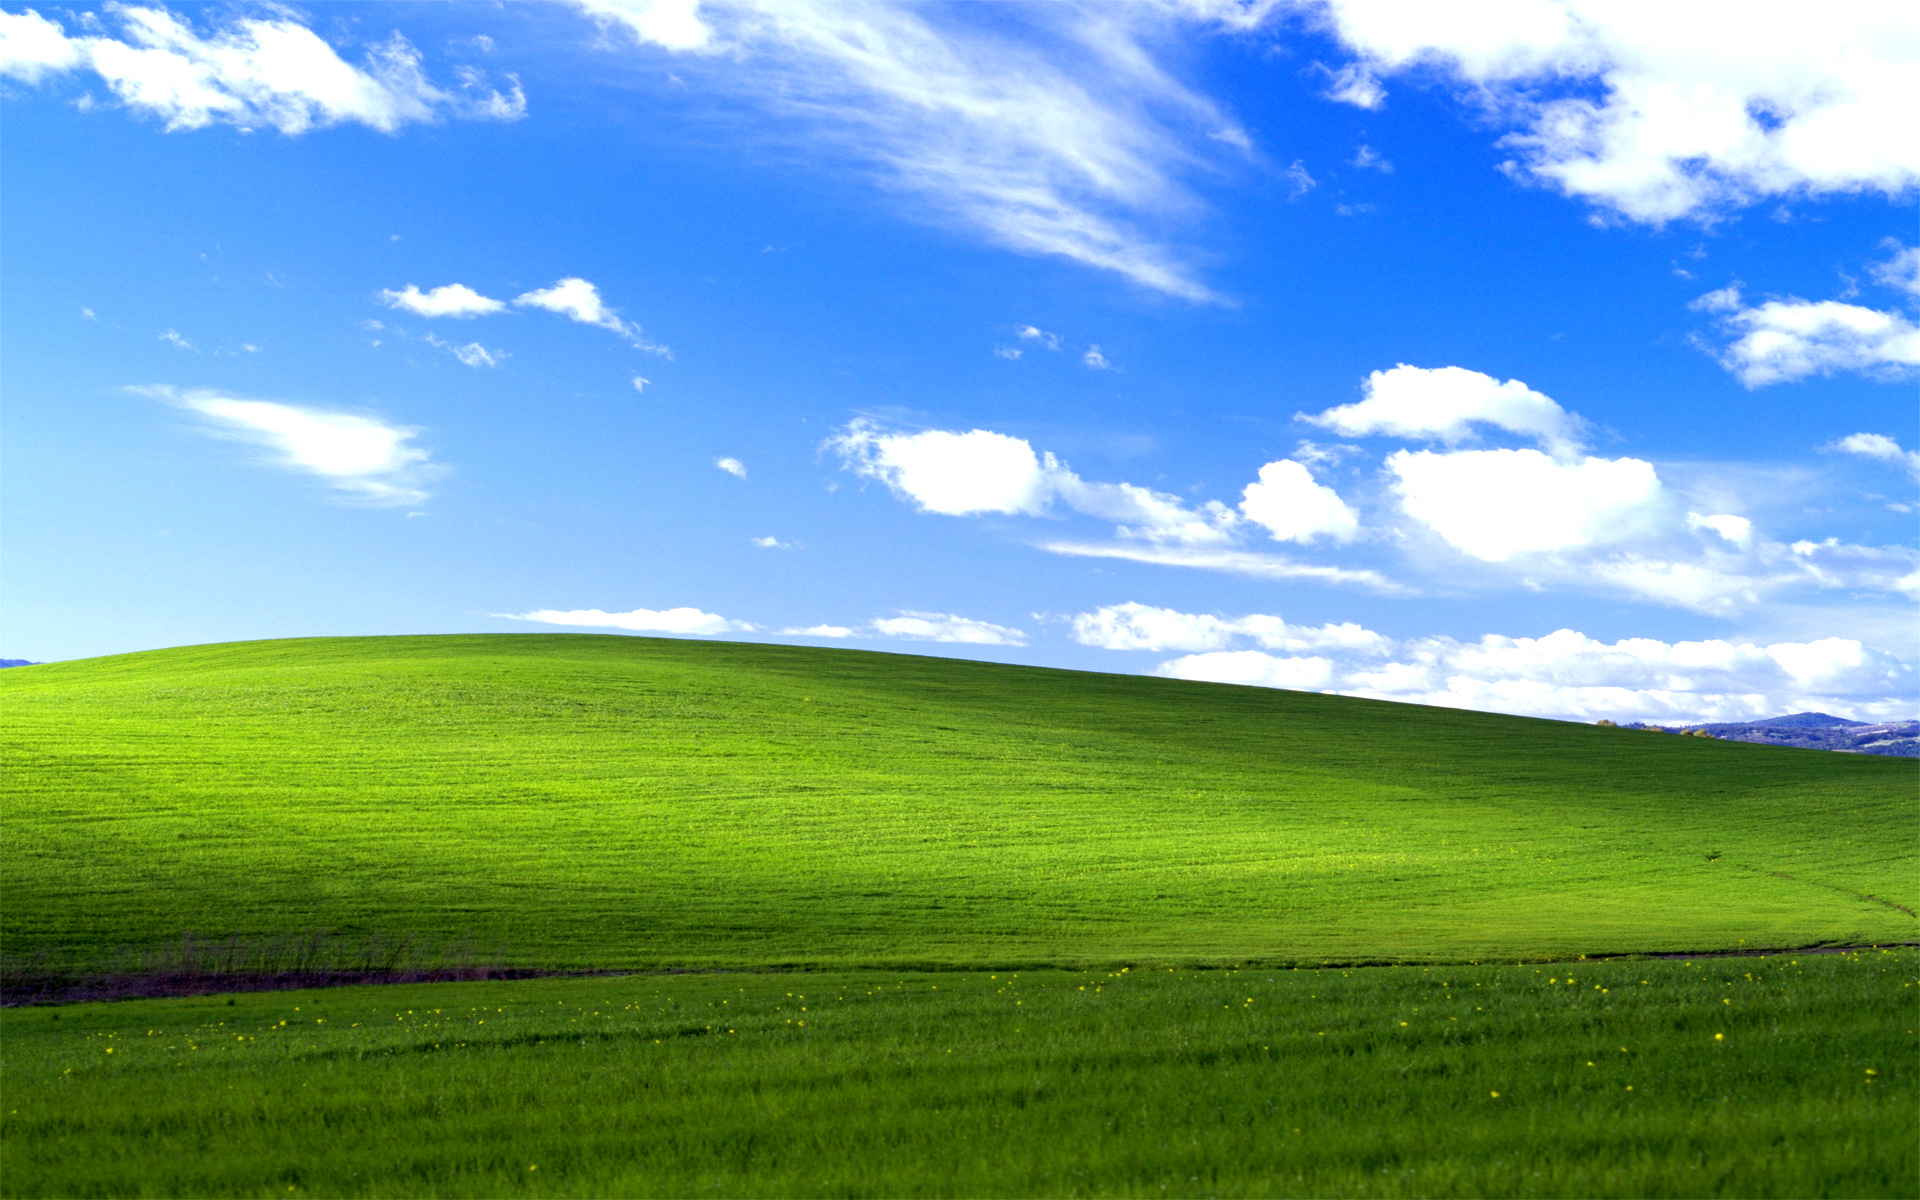 Windows XP Bliss Wallpapers HD Wallpapers 1920x1200